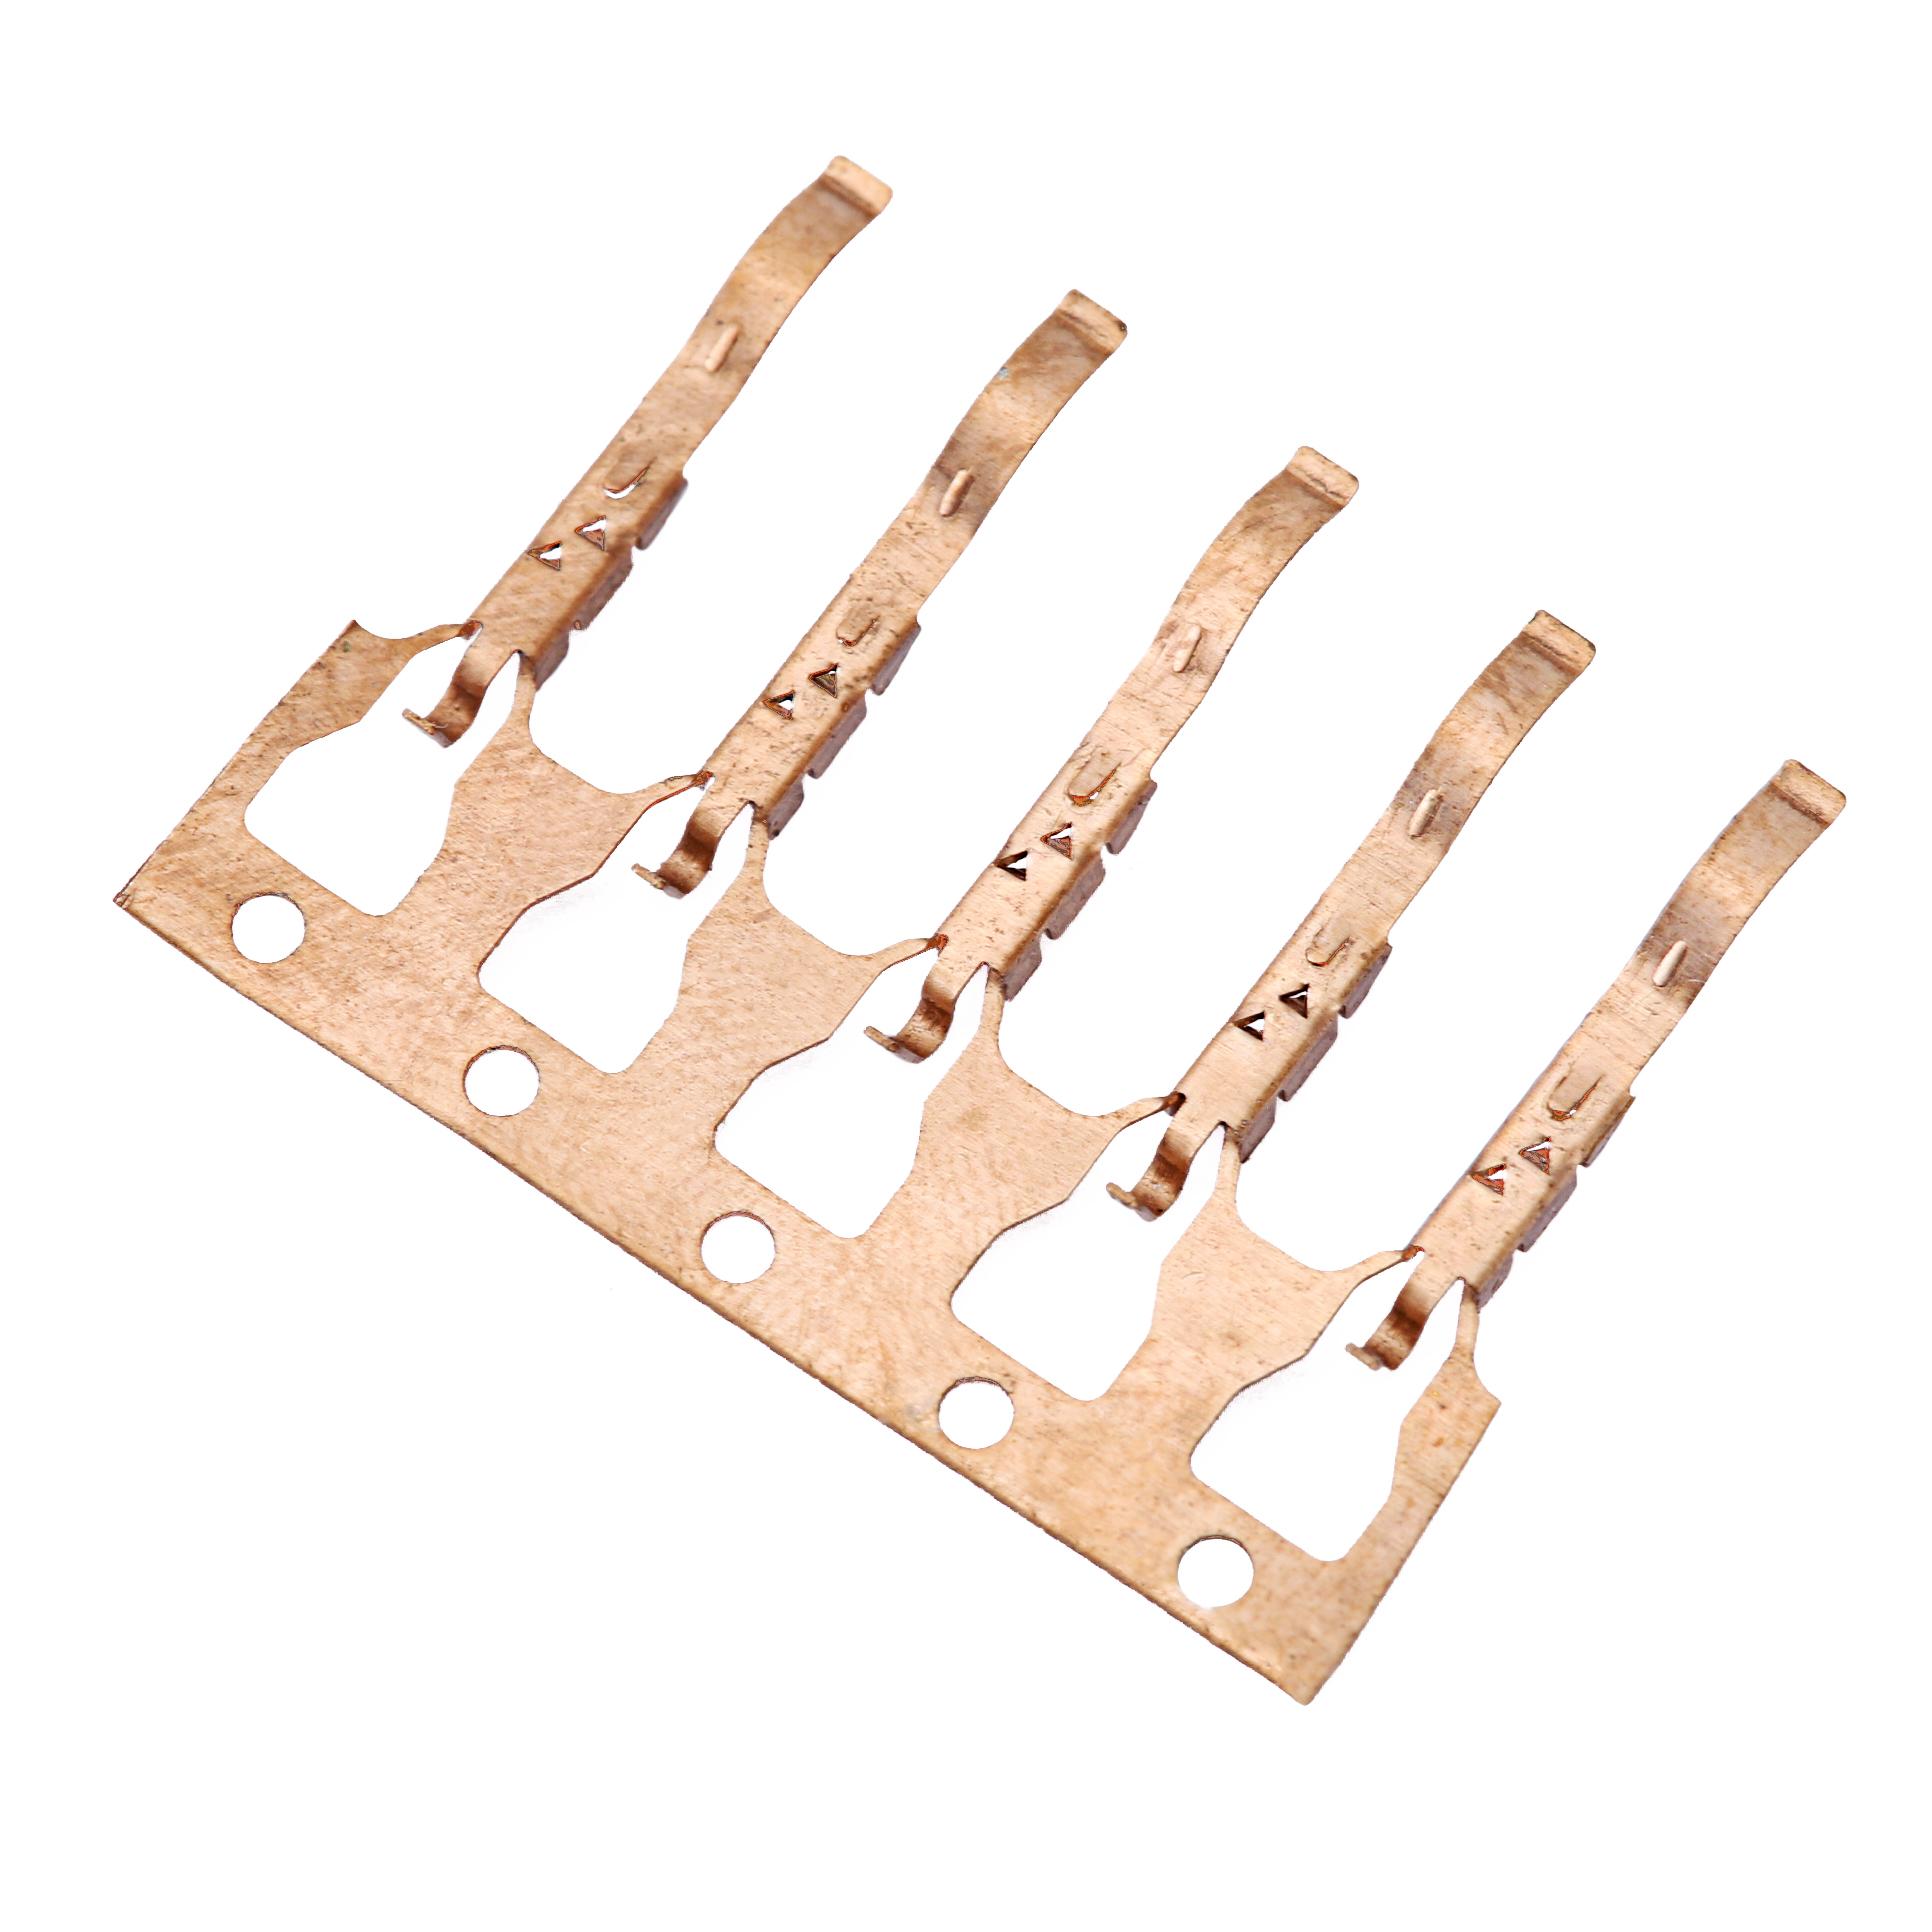 QD帶尾磷銅端子 電聲端子通訊接線端子五金彈片精密模具潮州端子廠家直銷